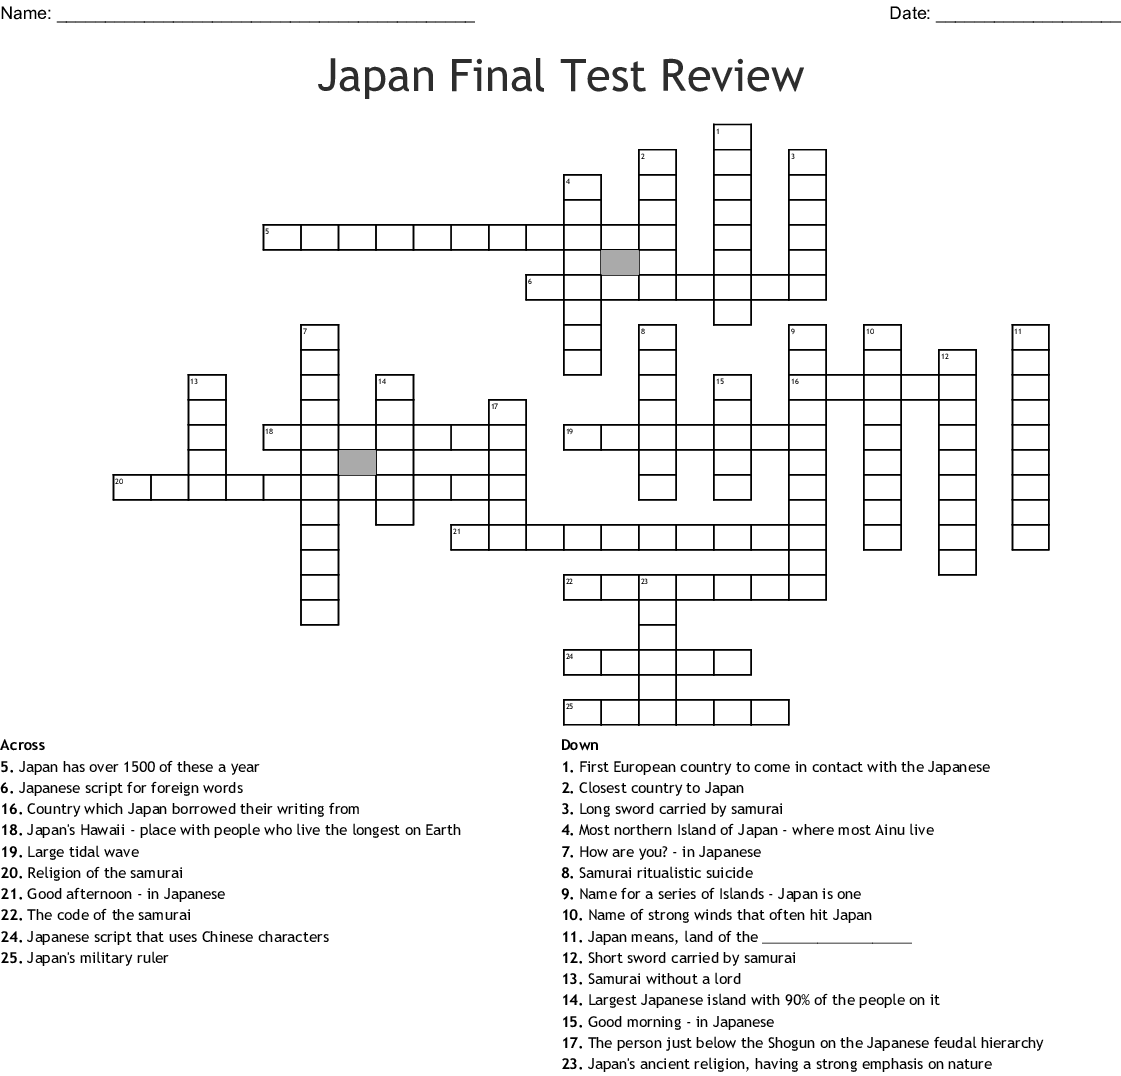 Japan Final Test Review Crossword